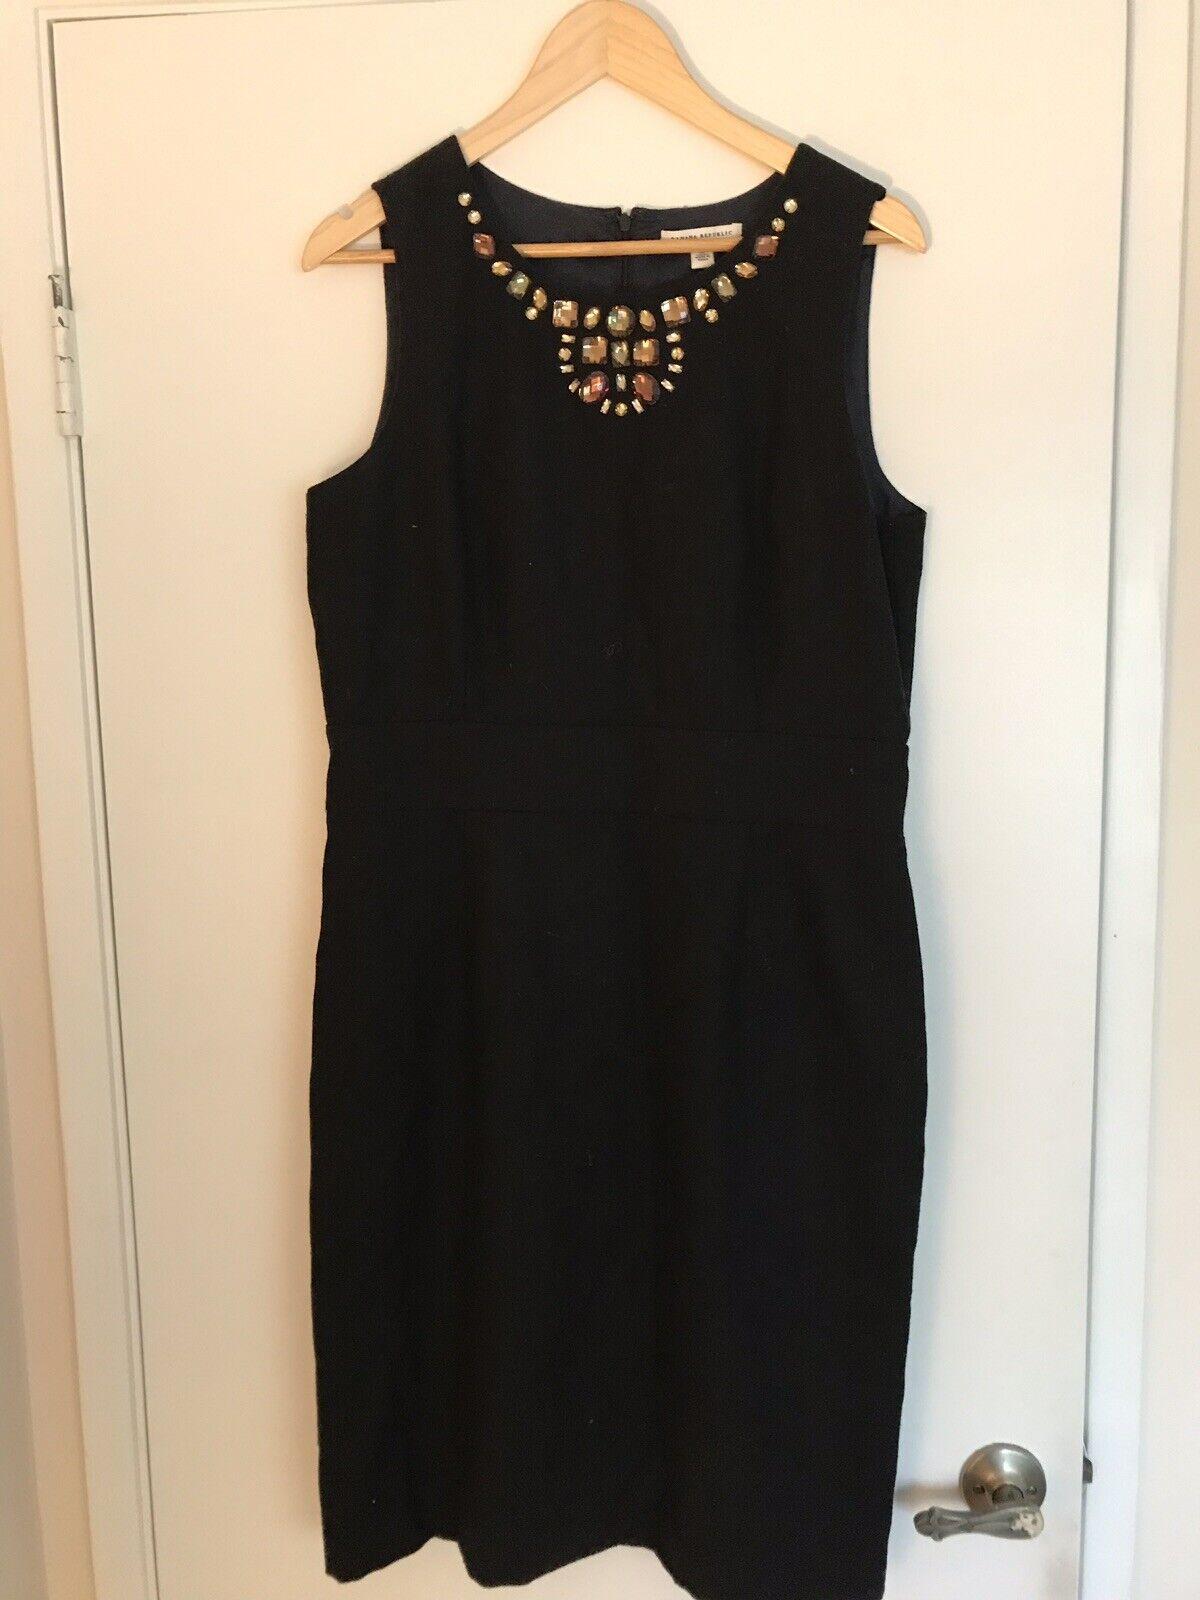 Banana Republic schwarz Wool Sheath Dress Größe 14